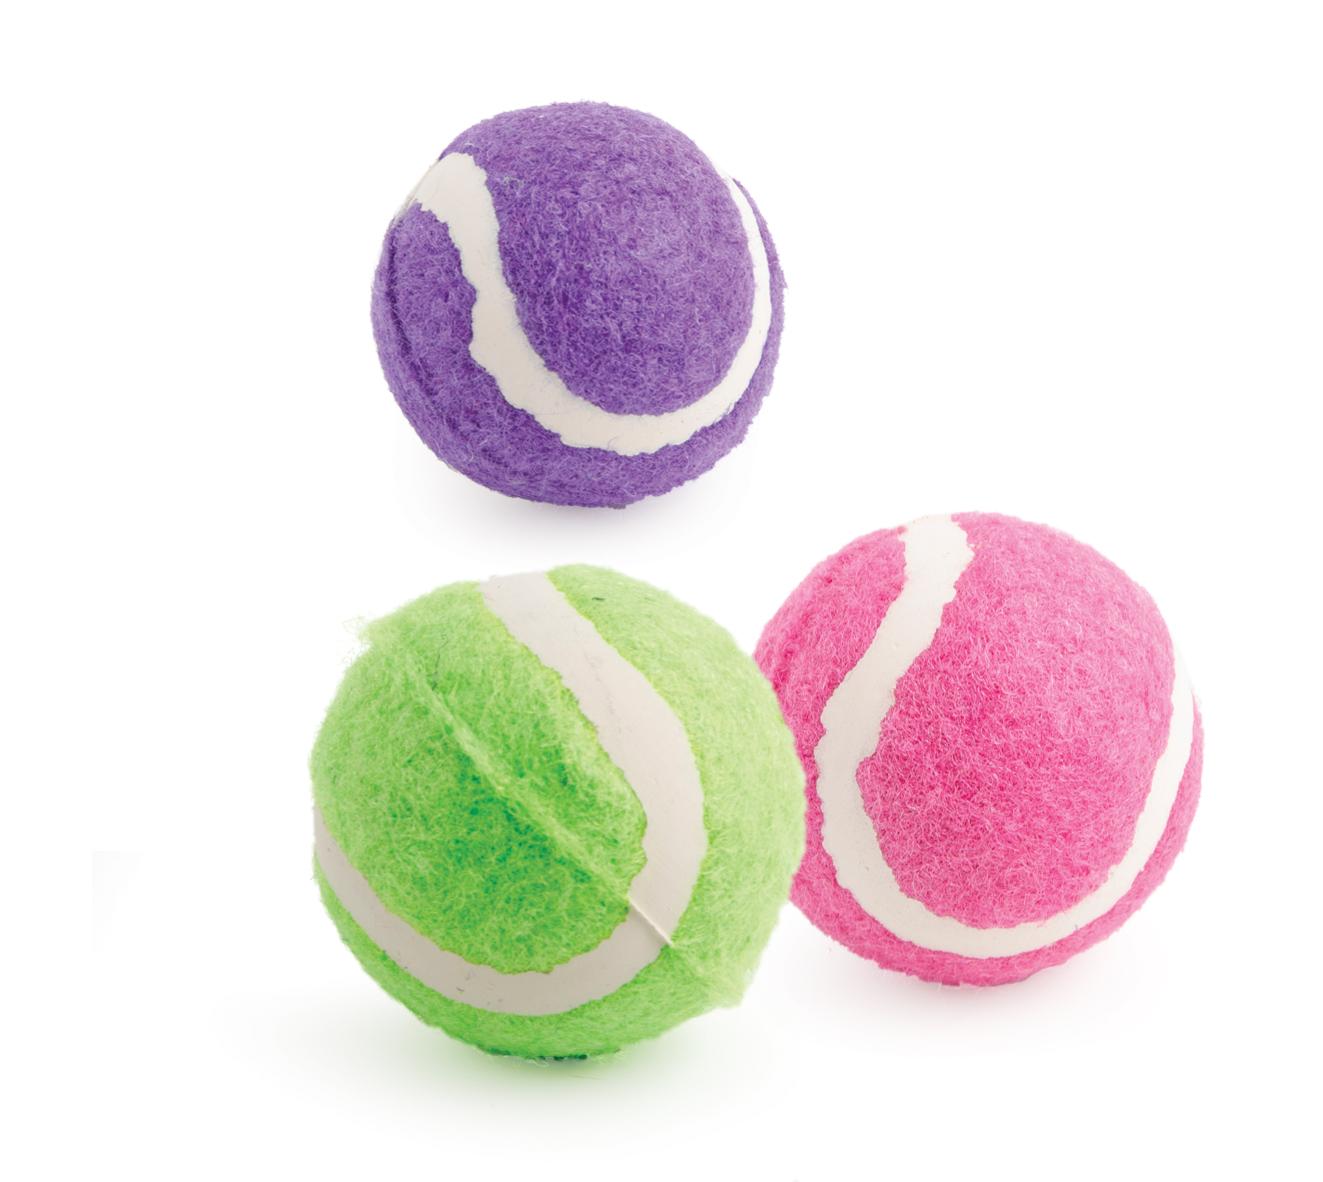 Small Toy Balls : Dog balls bing images